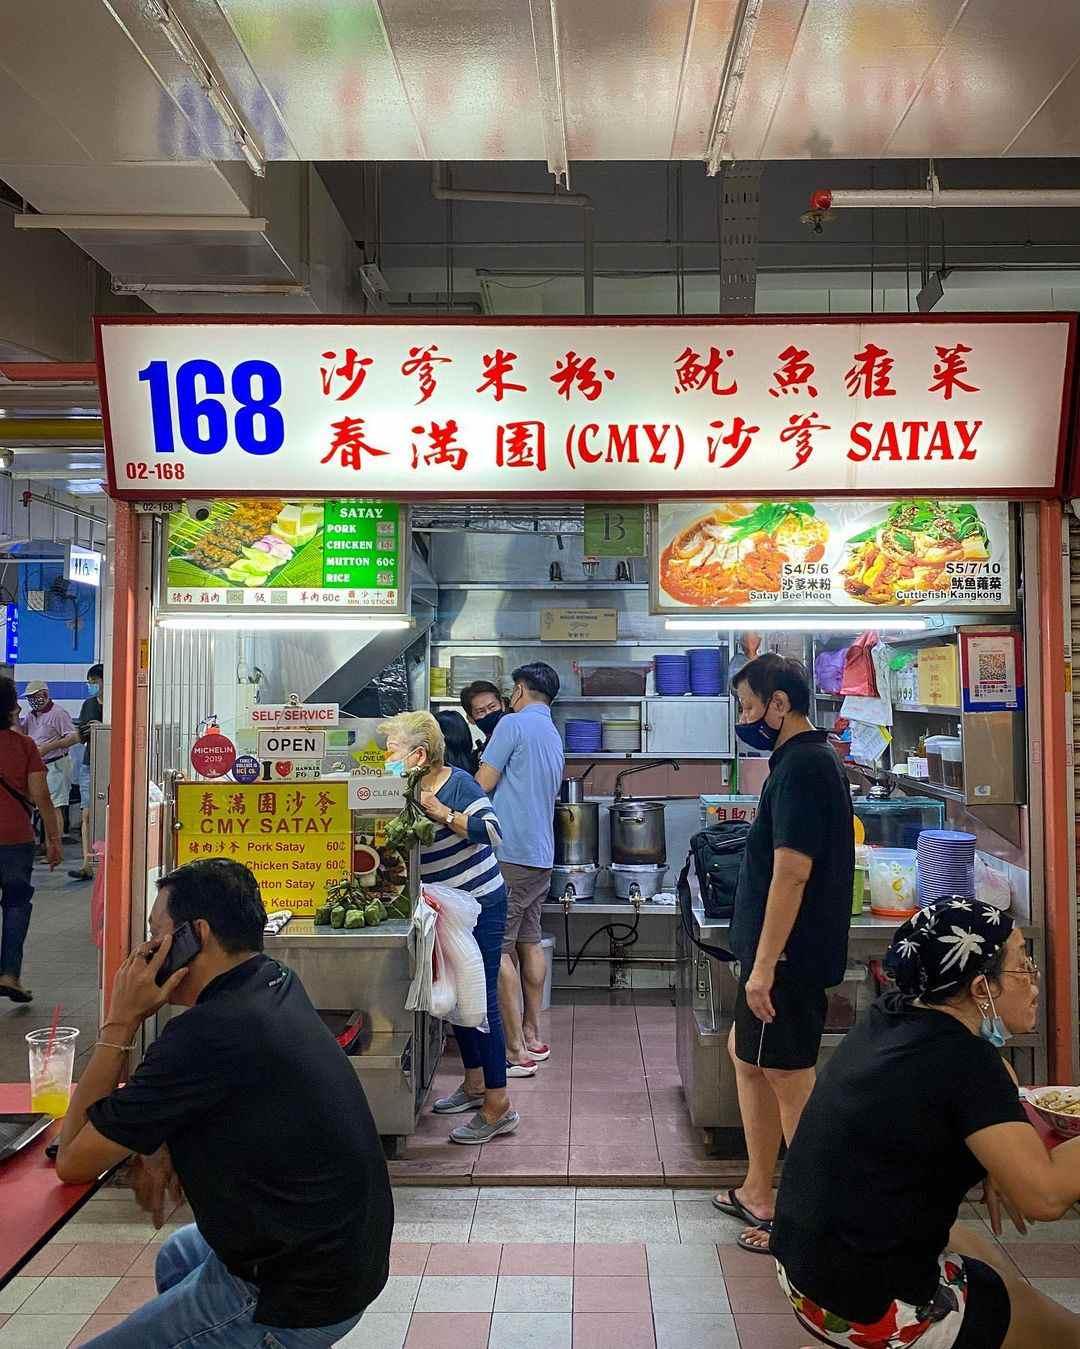 168 cmy satay storefront